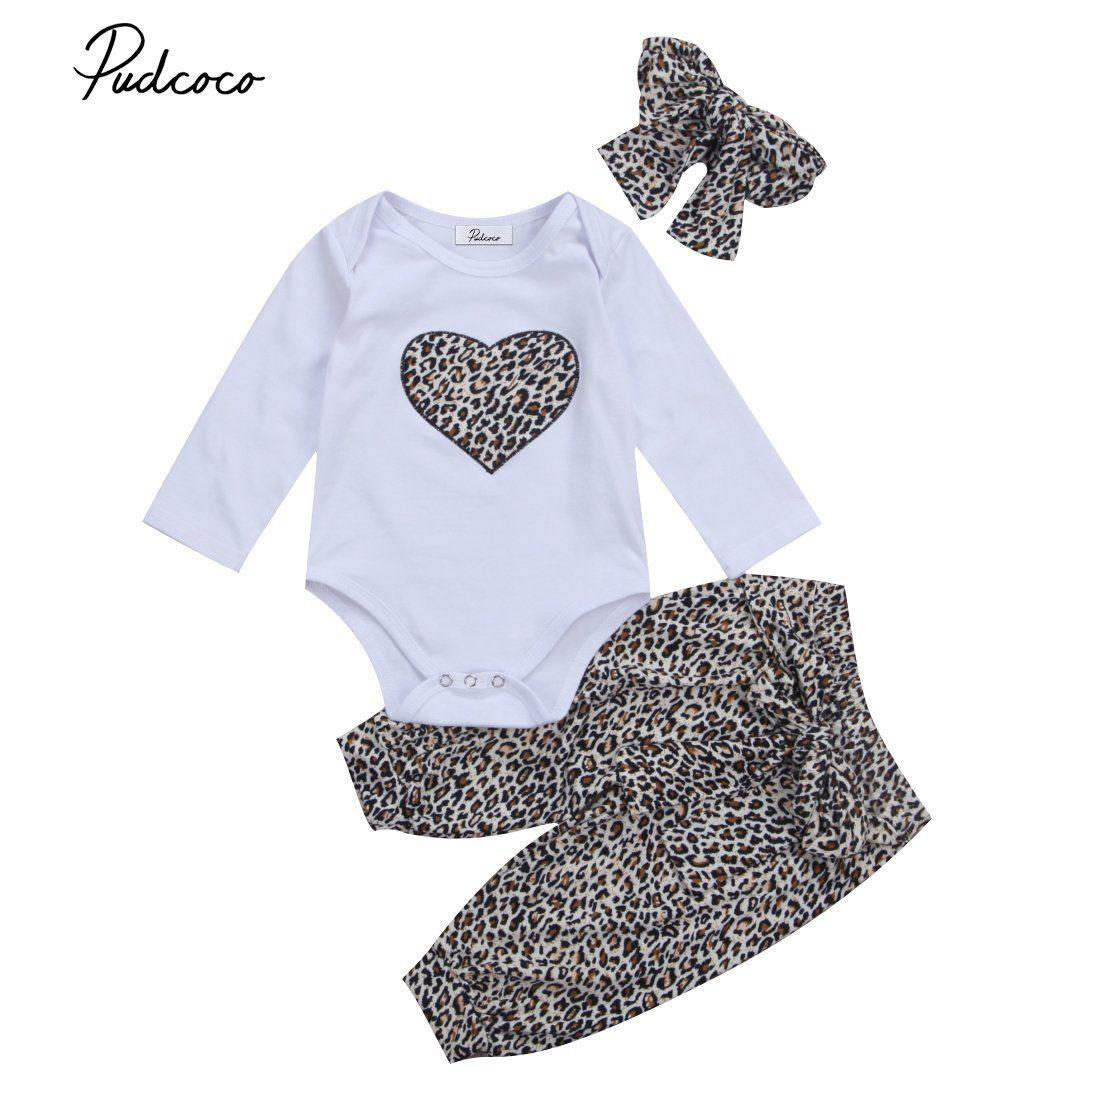 Infant Baby Girl Leopard print Clothes Tops Romper Long Pant Newborn 2pcs Outfit